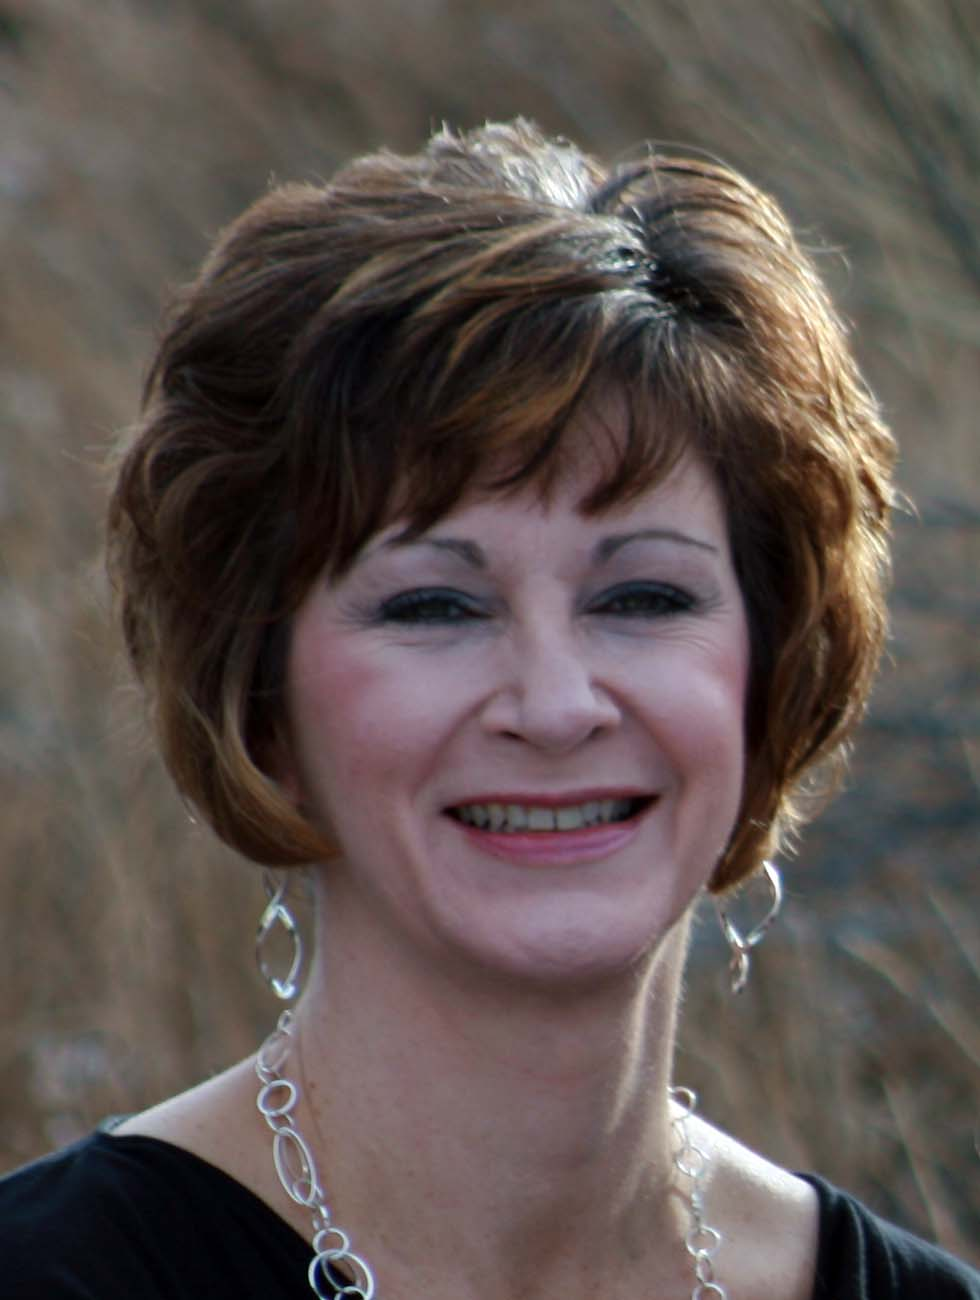 Christine Coleman Headshot 3.jpg